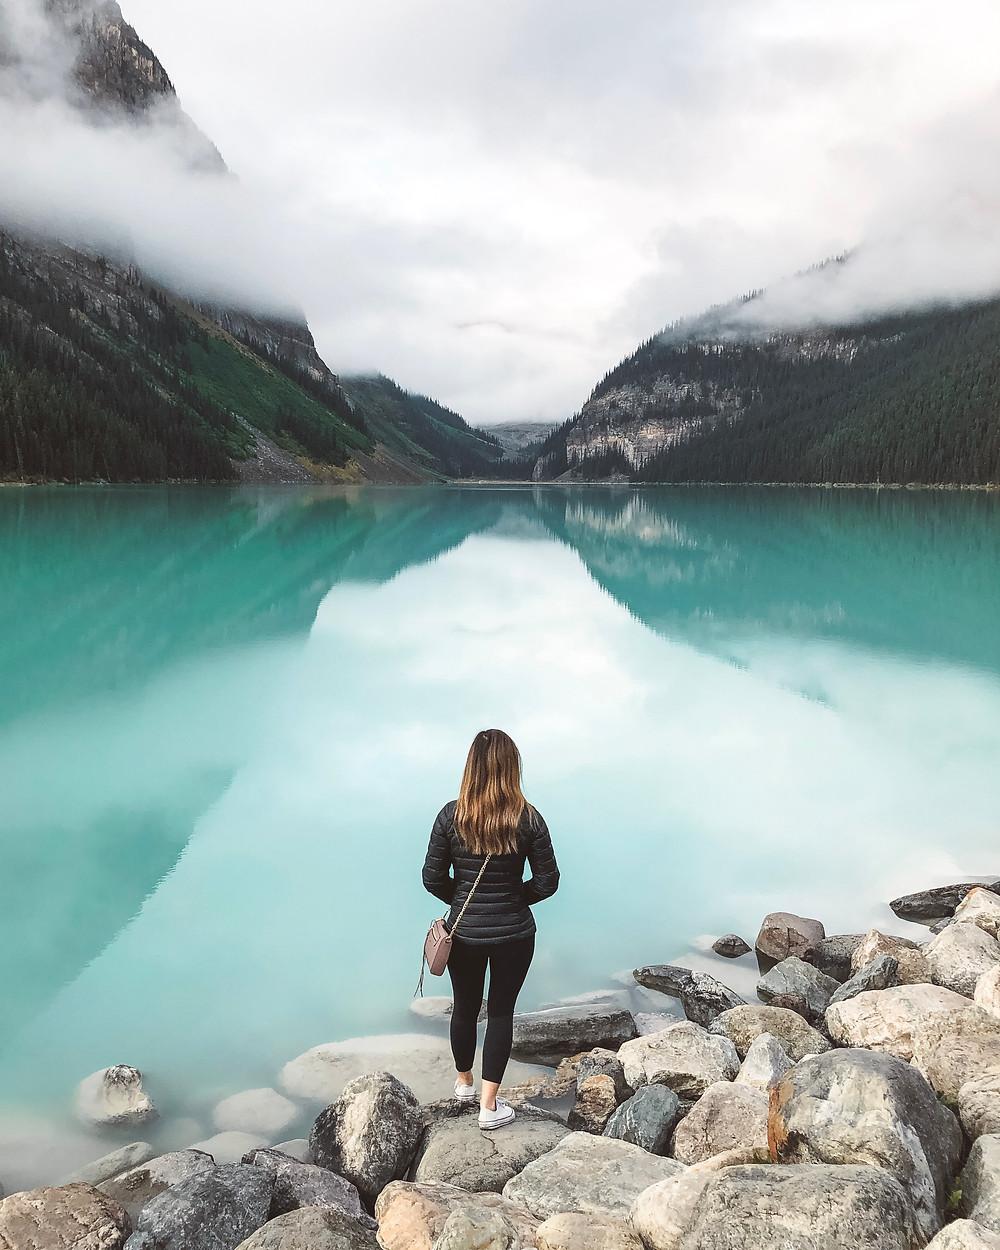 lake louise alberta canada emerald turquoise lake